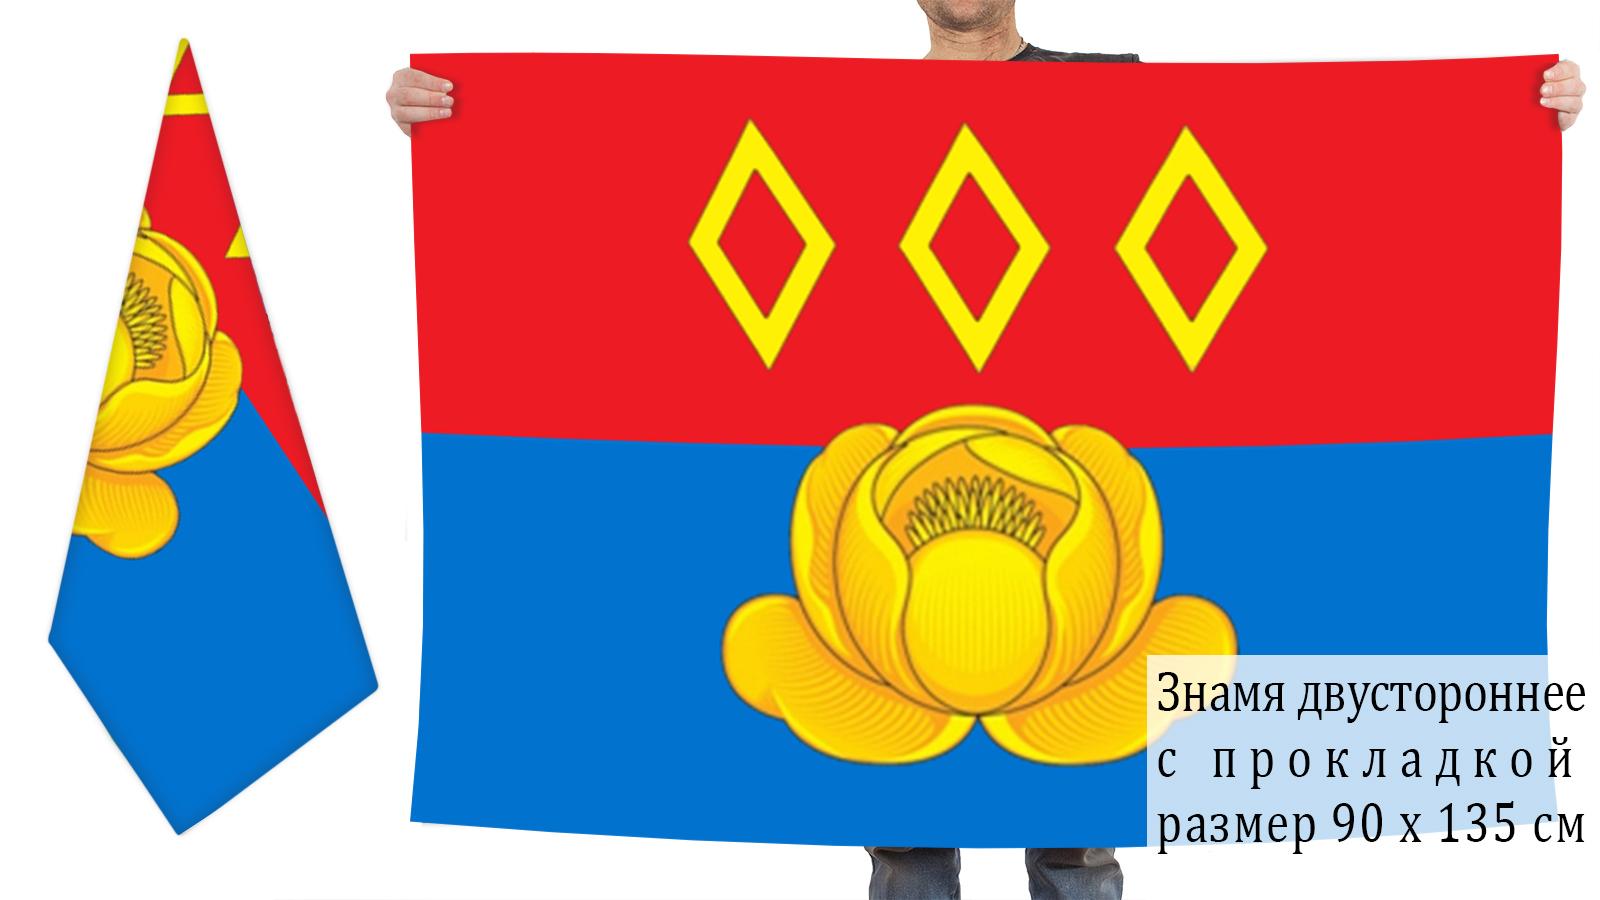 Двусторонний флаг Старой Купавны